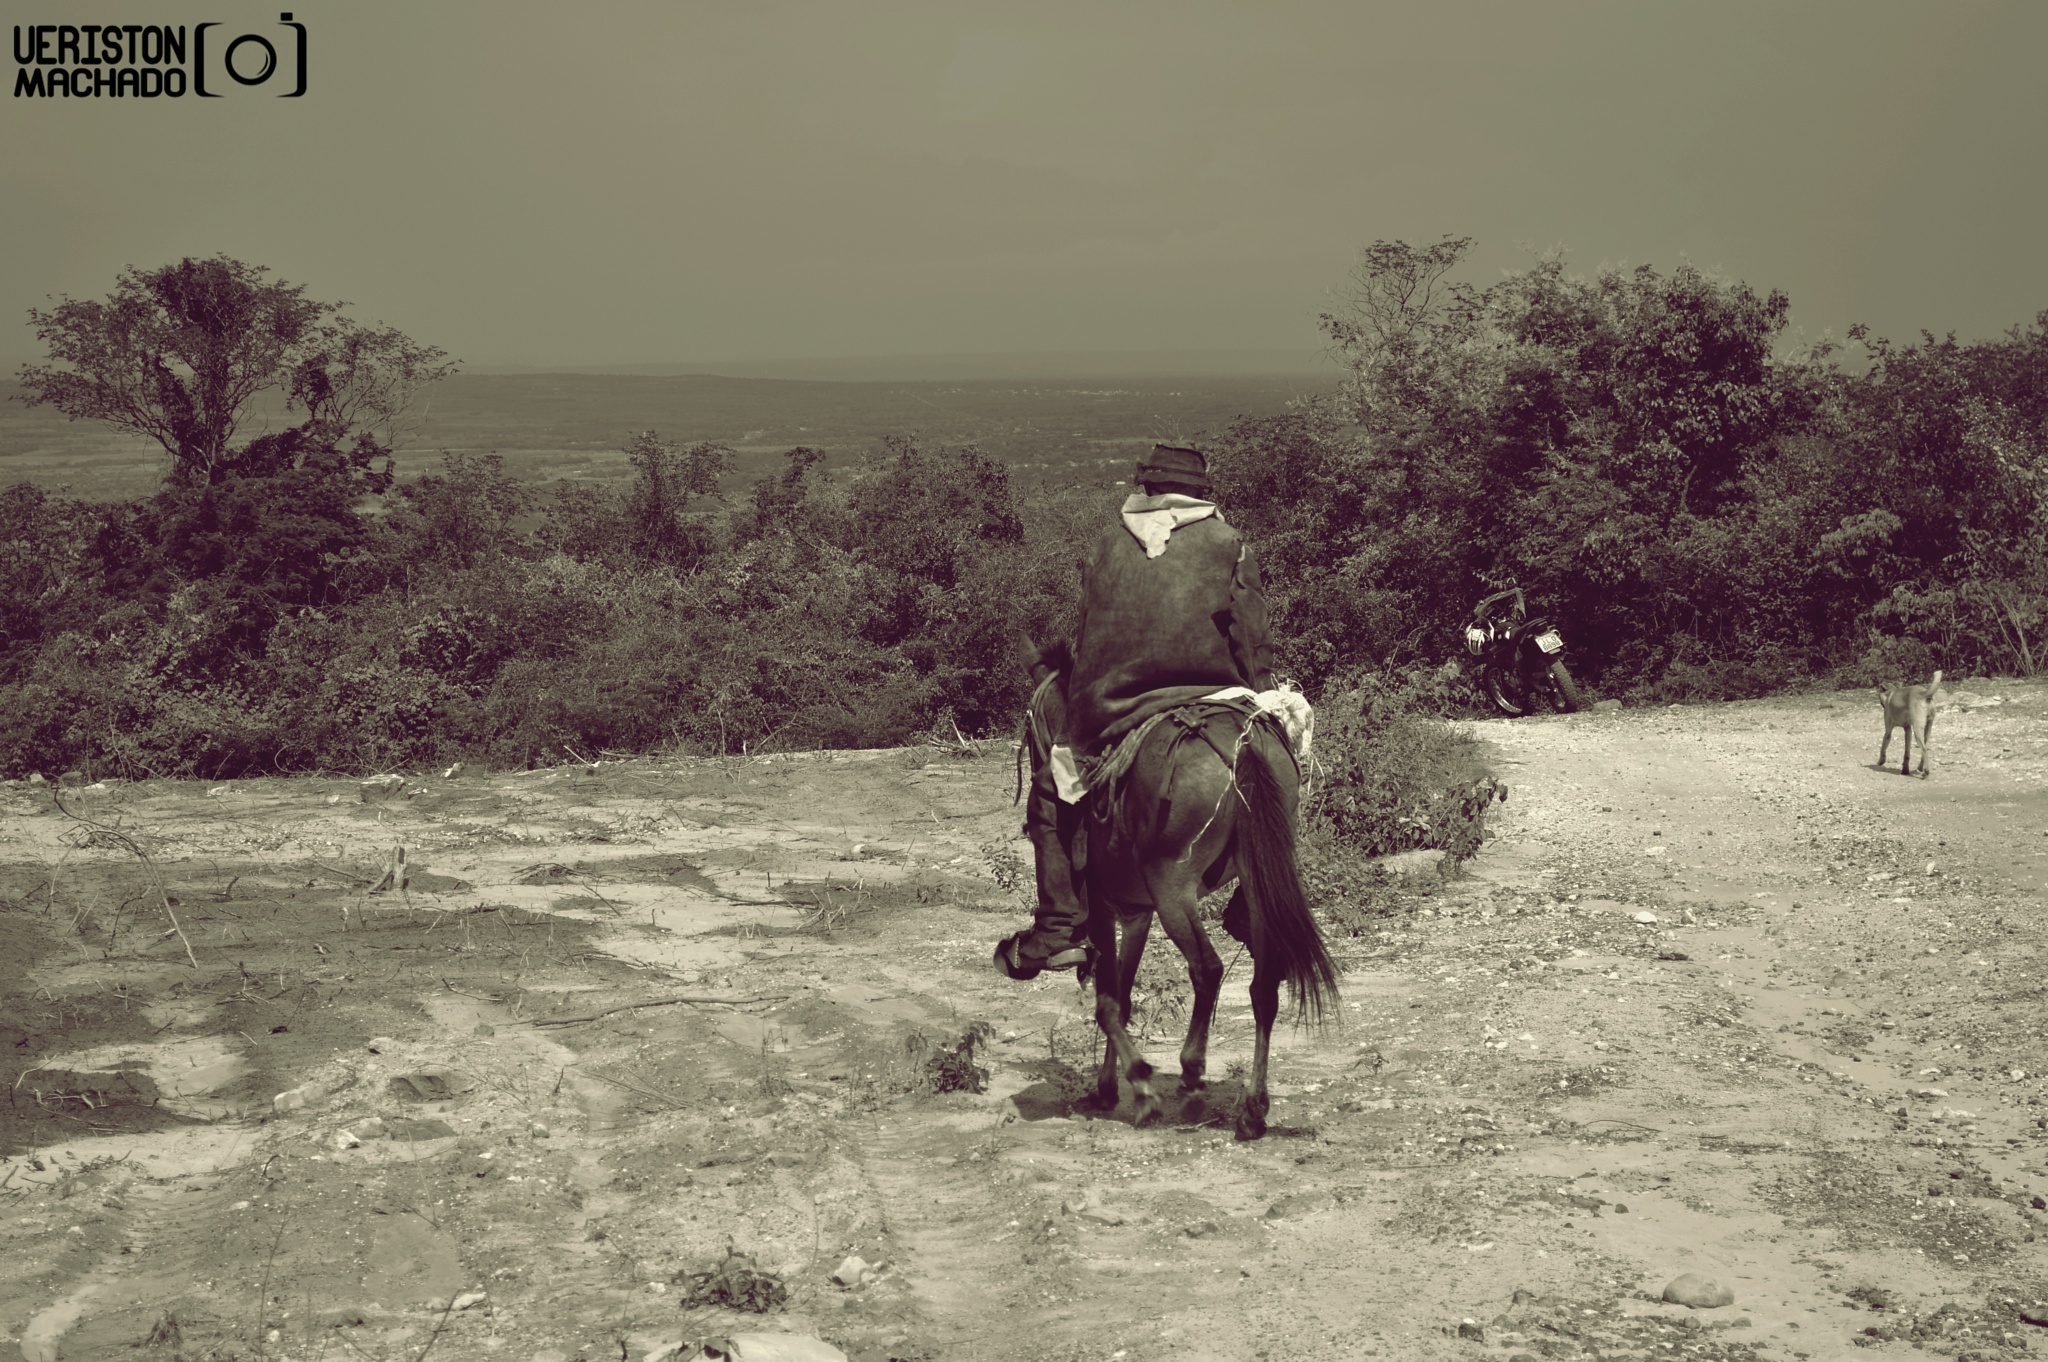 O Vaqueiro by Ueriston Machado